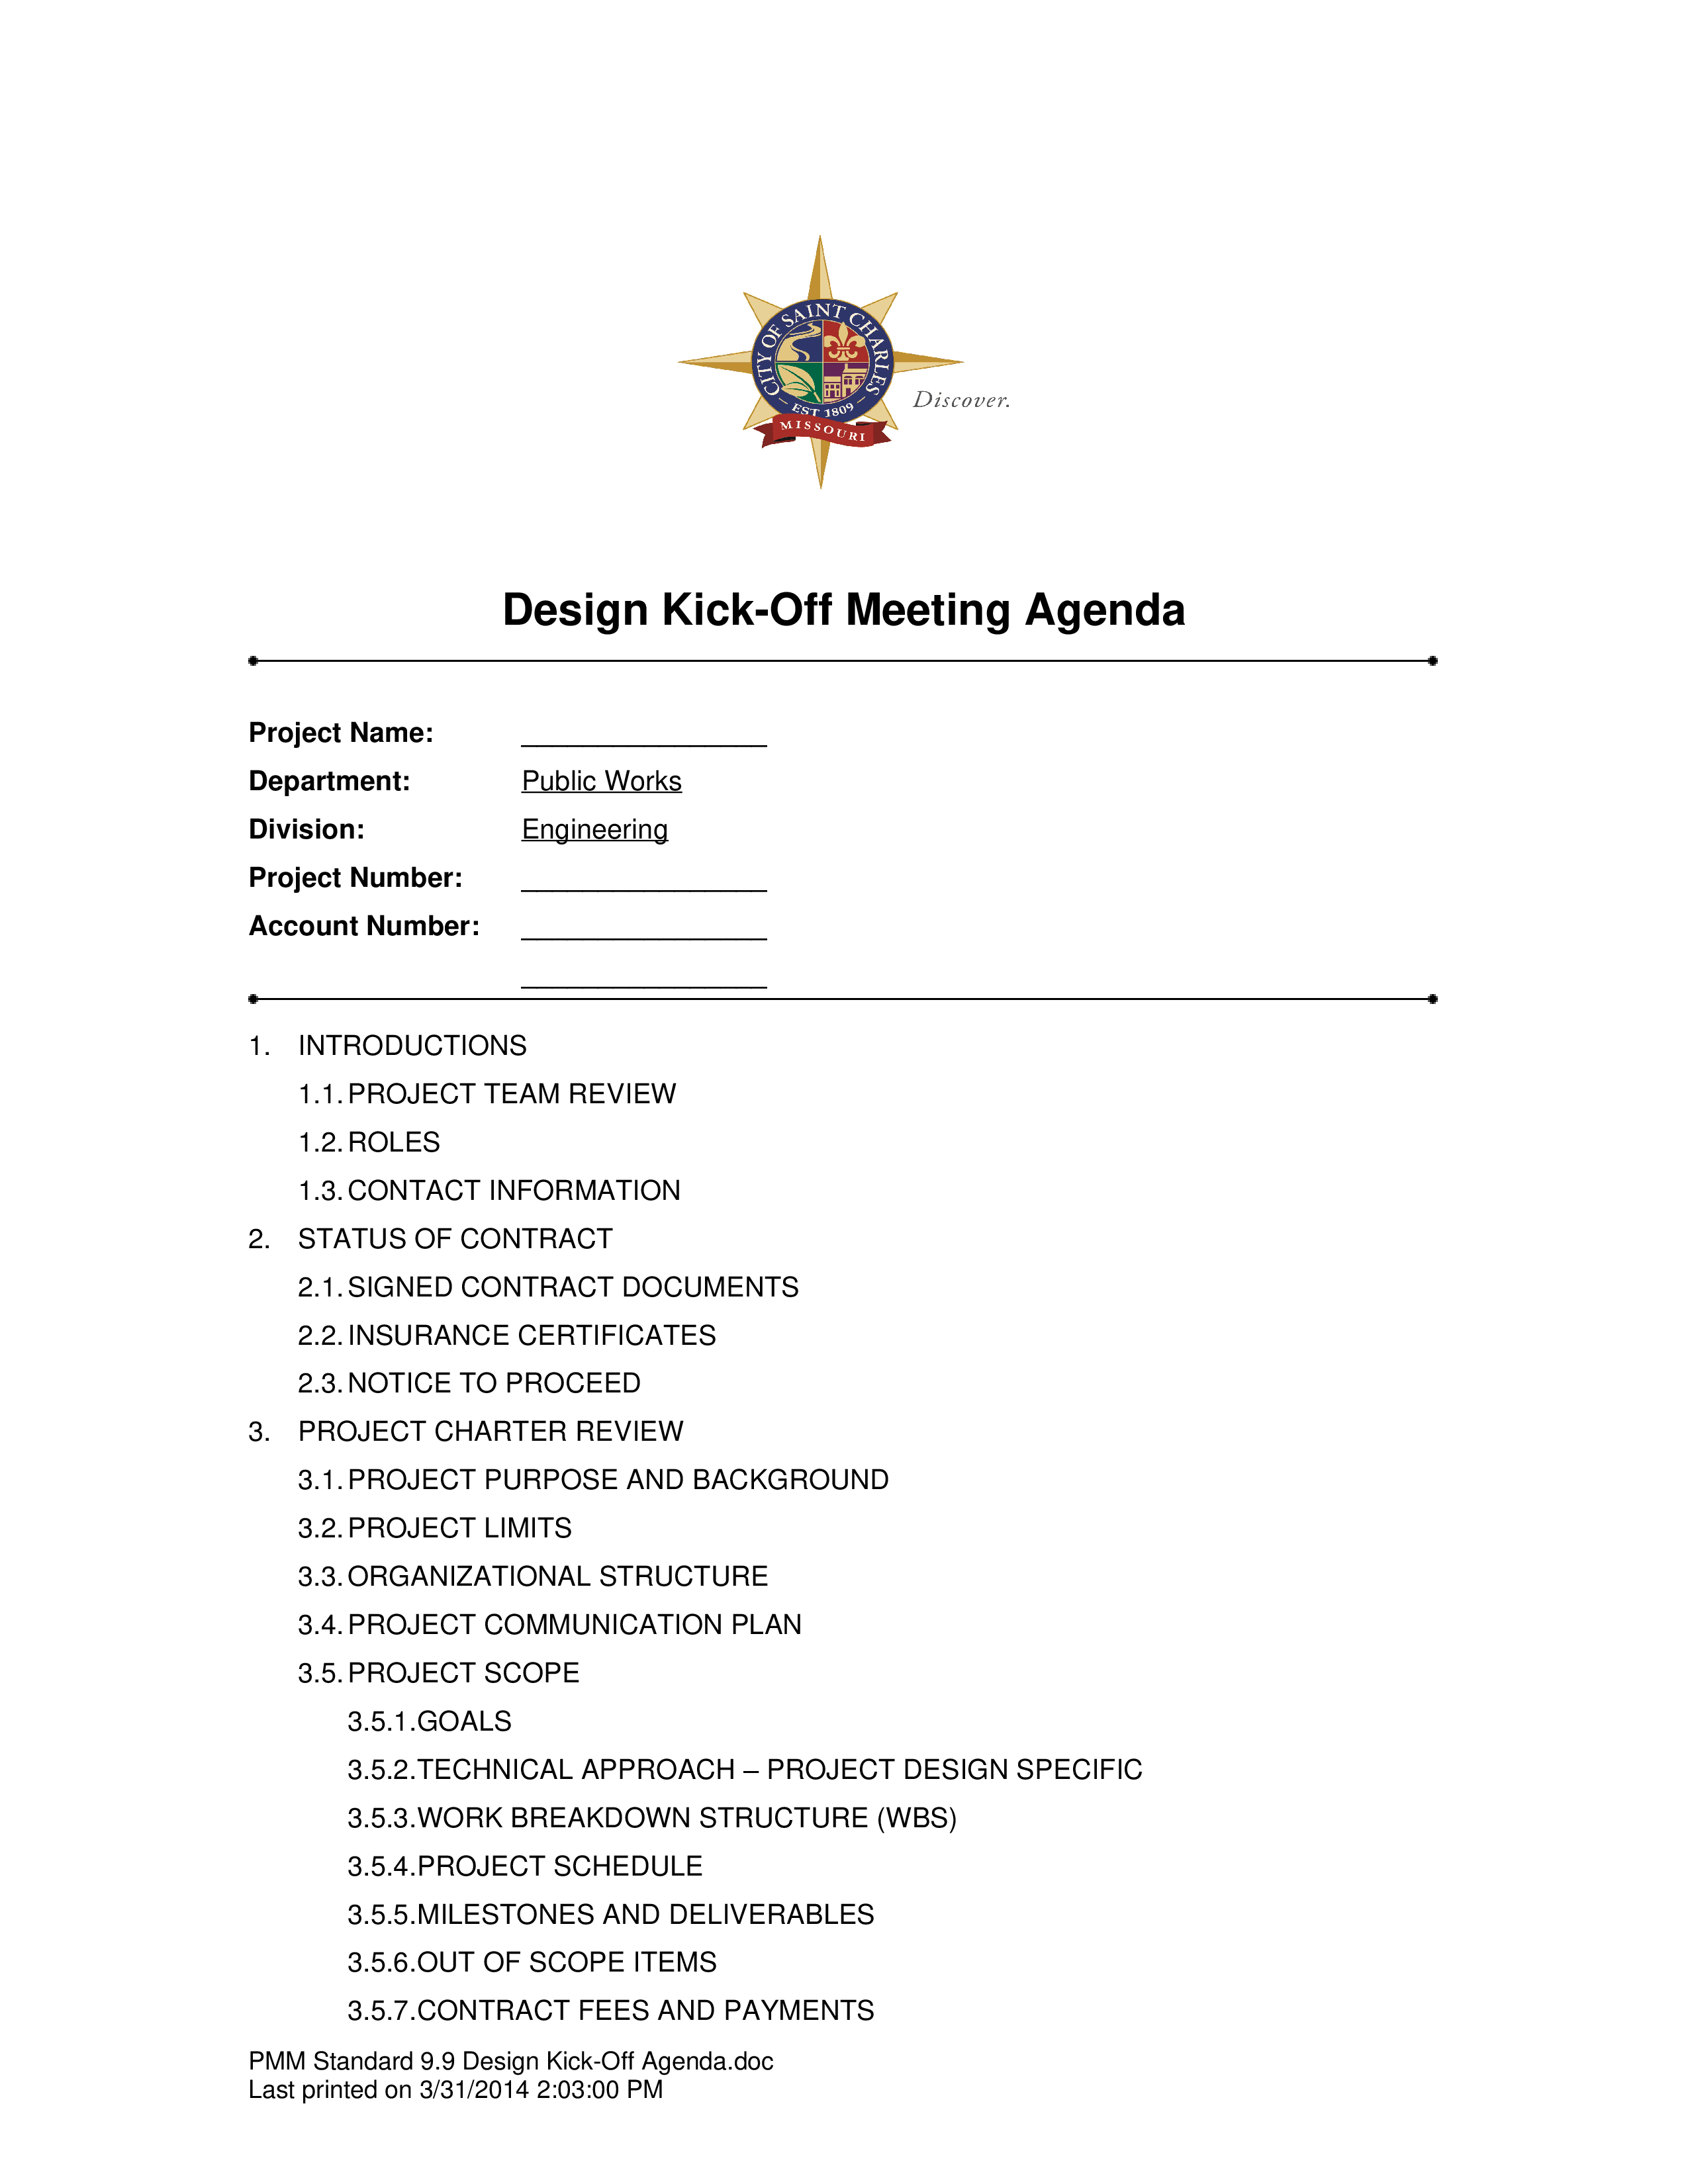 Design Kick Off Meeting Agenda Main Image Template